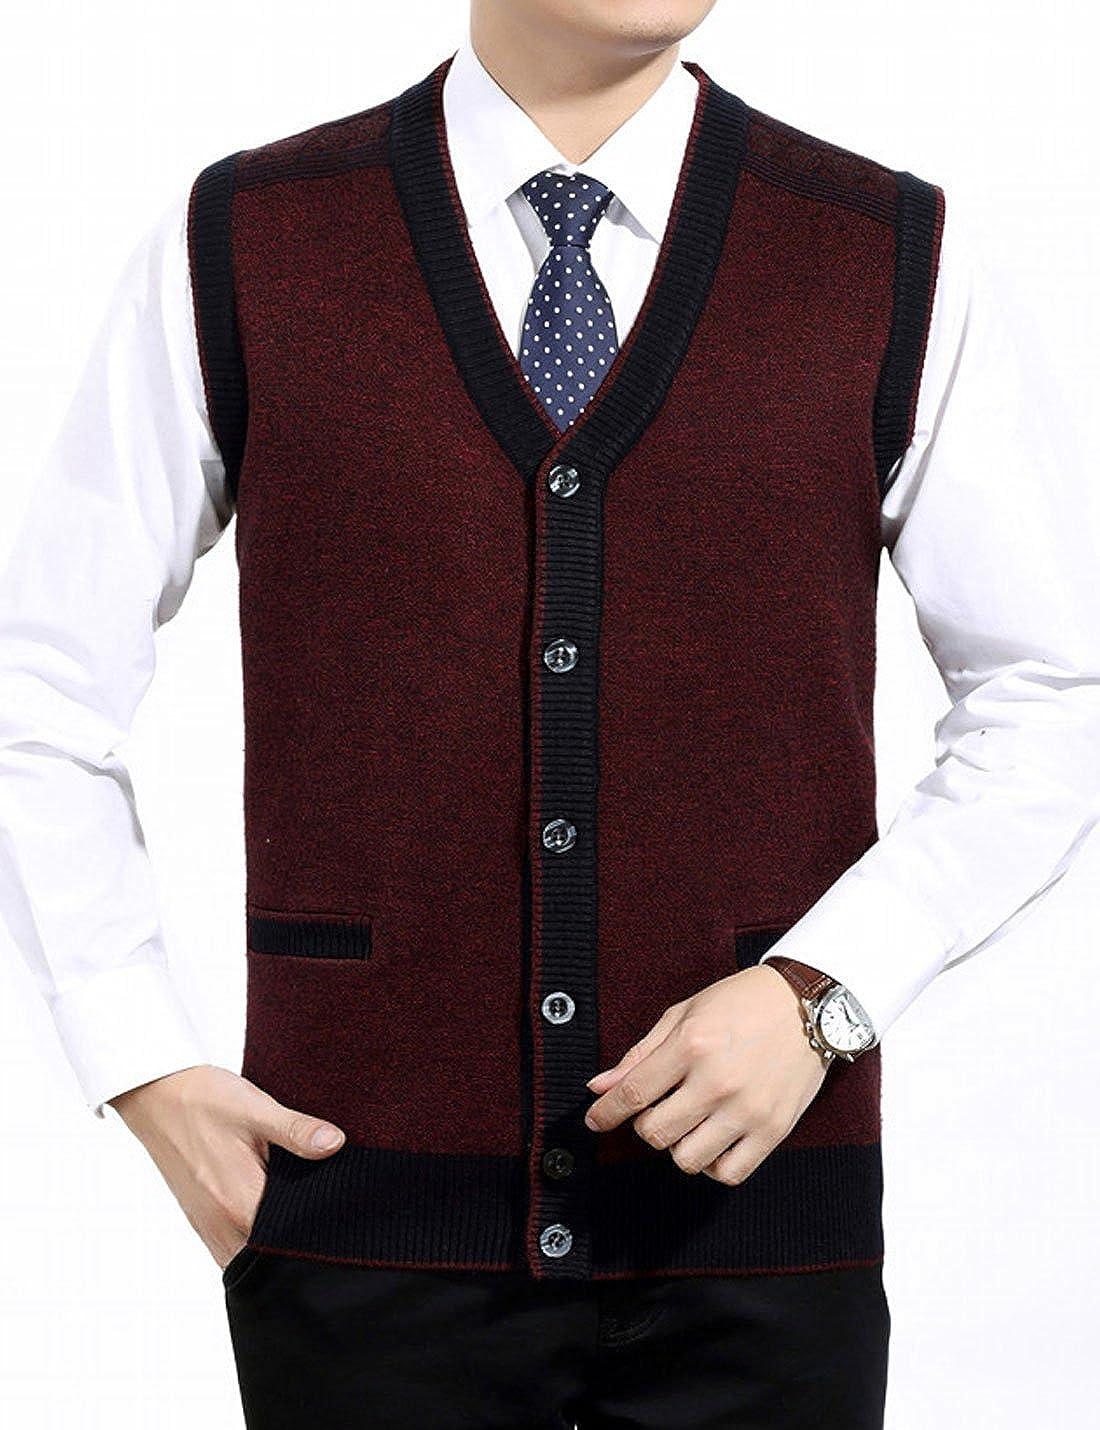 Yeokou Mens Slim Button Down V Neck Wool Sleeveless Cardigan Sweater Vest Gilet